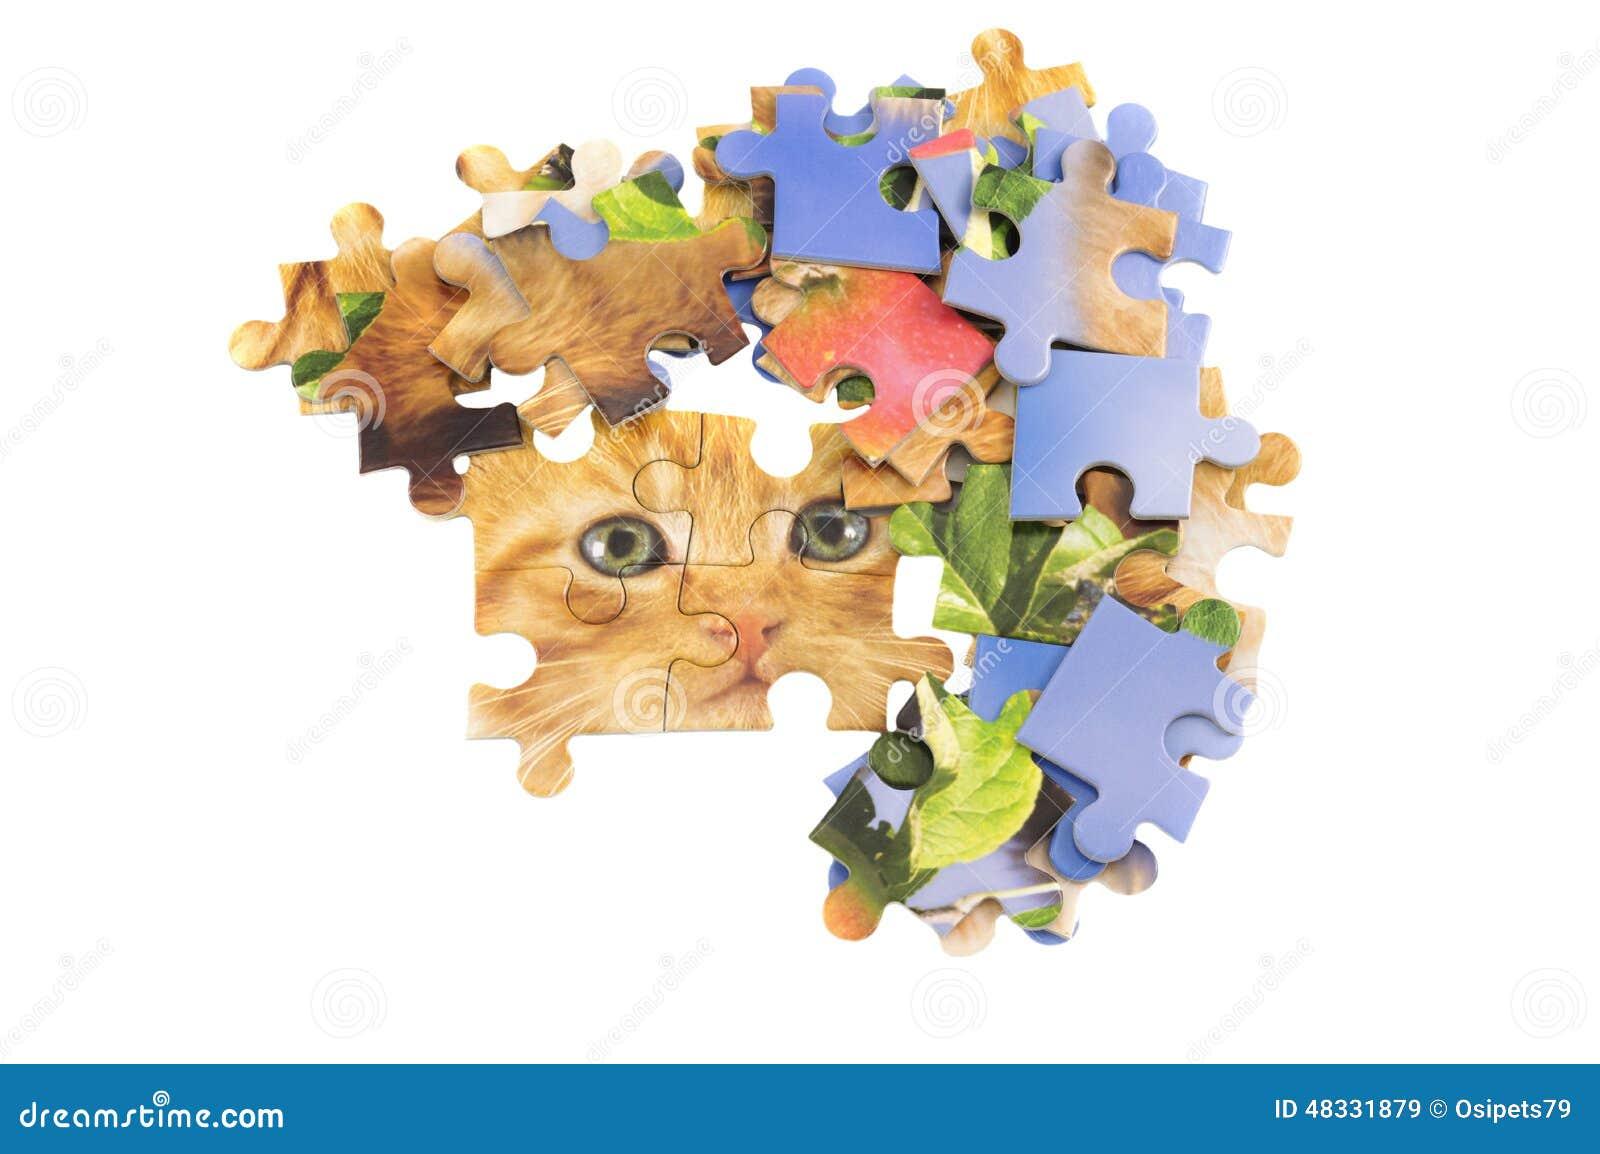 Cat jigsaw puzzle pieces